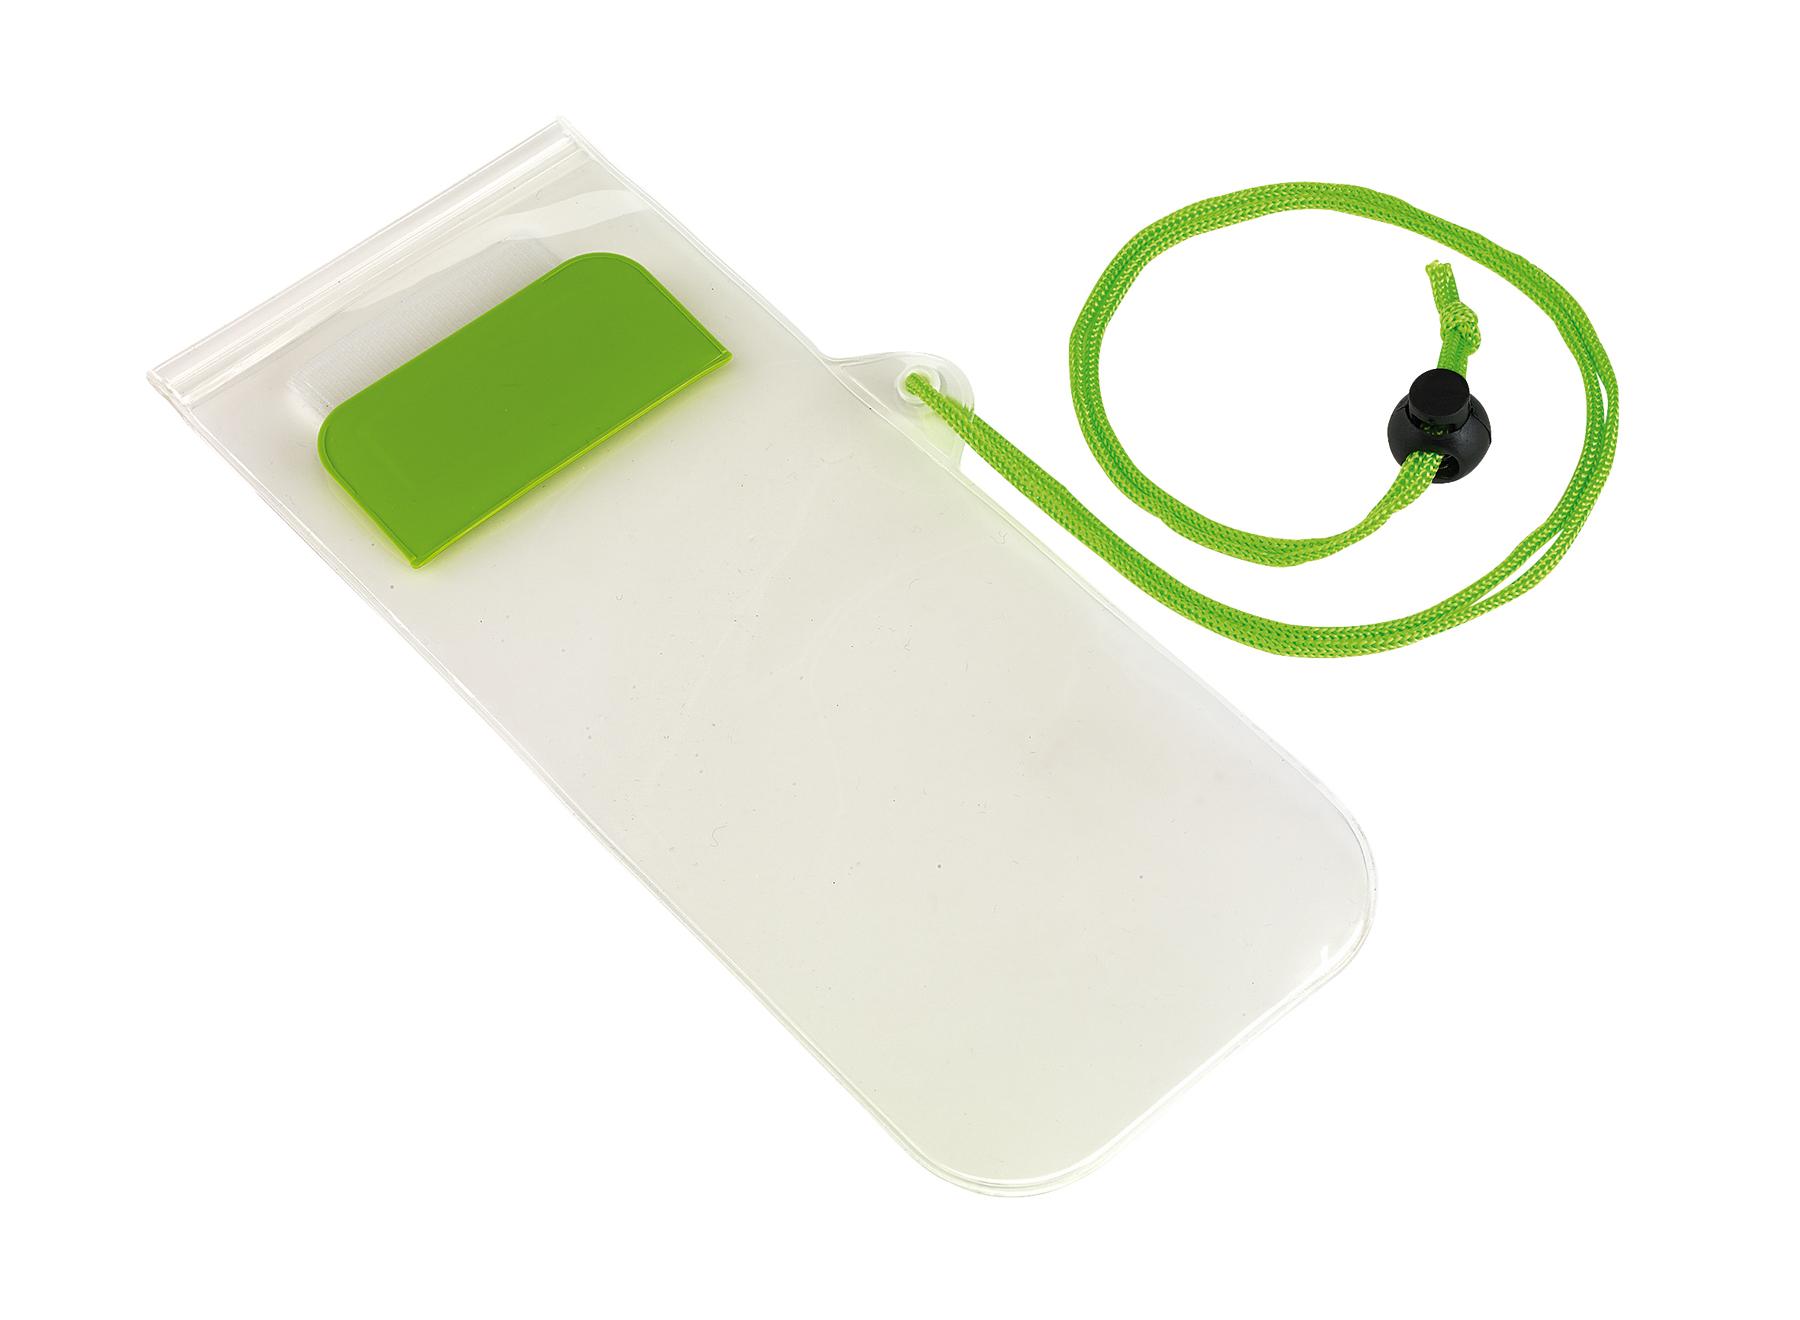 Torebka na telefon SMART SPLASH, zielone jabłko